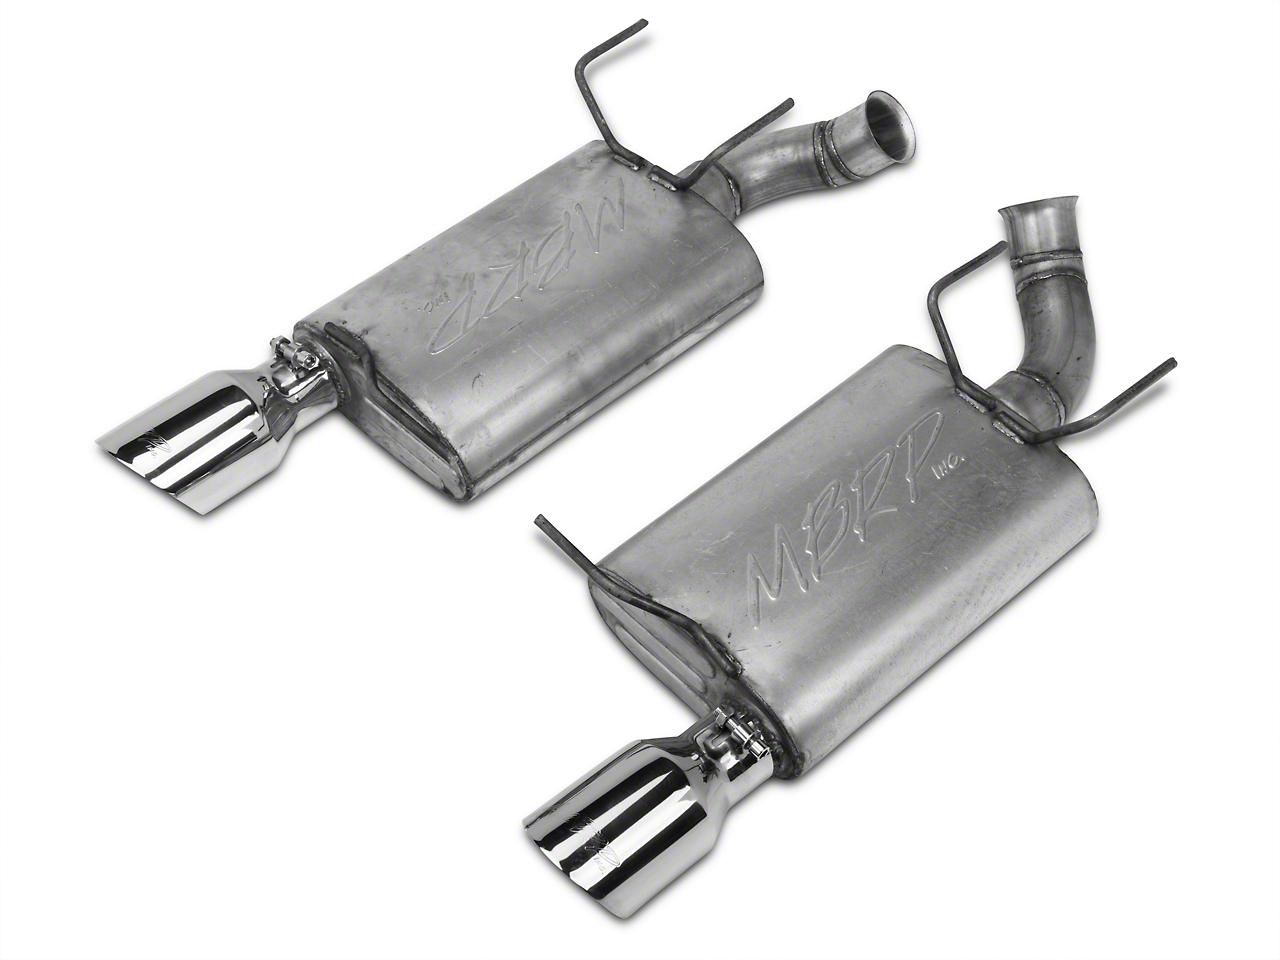 MBRP Installer Series Axle-Back Exhaust - Aluminized (11-14 V6)